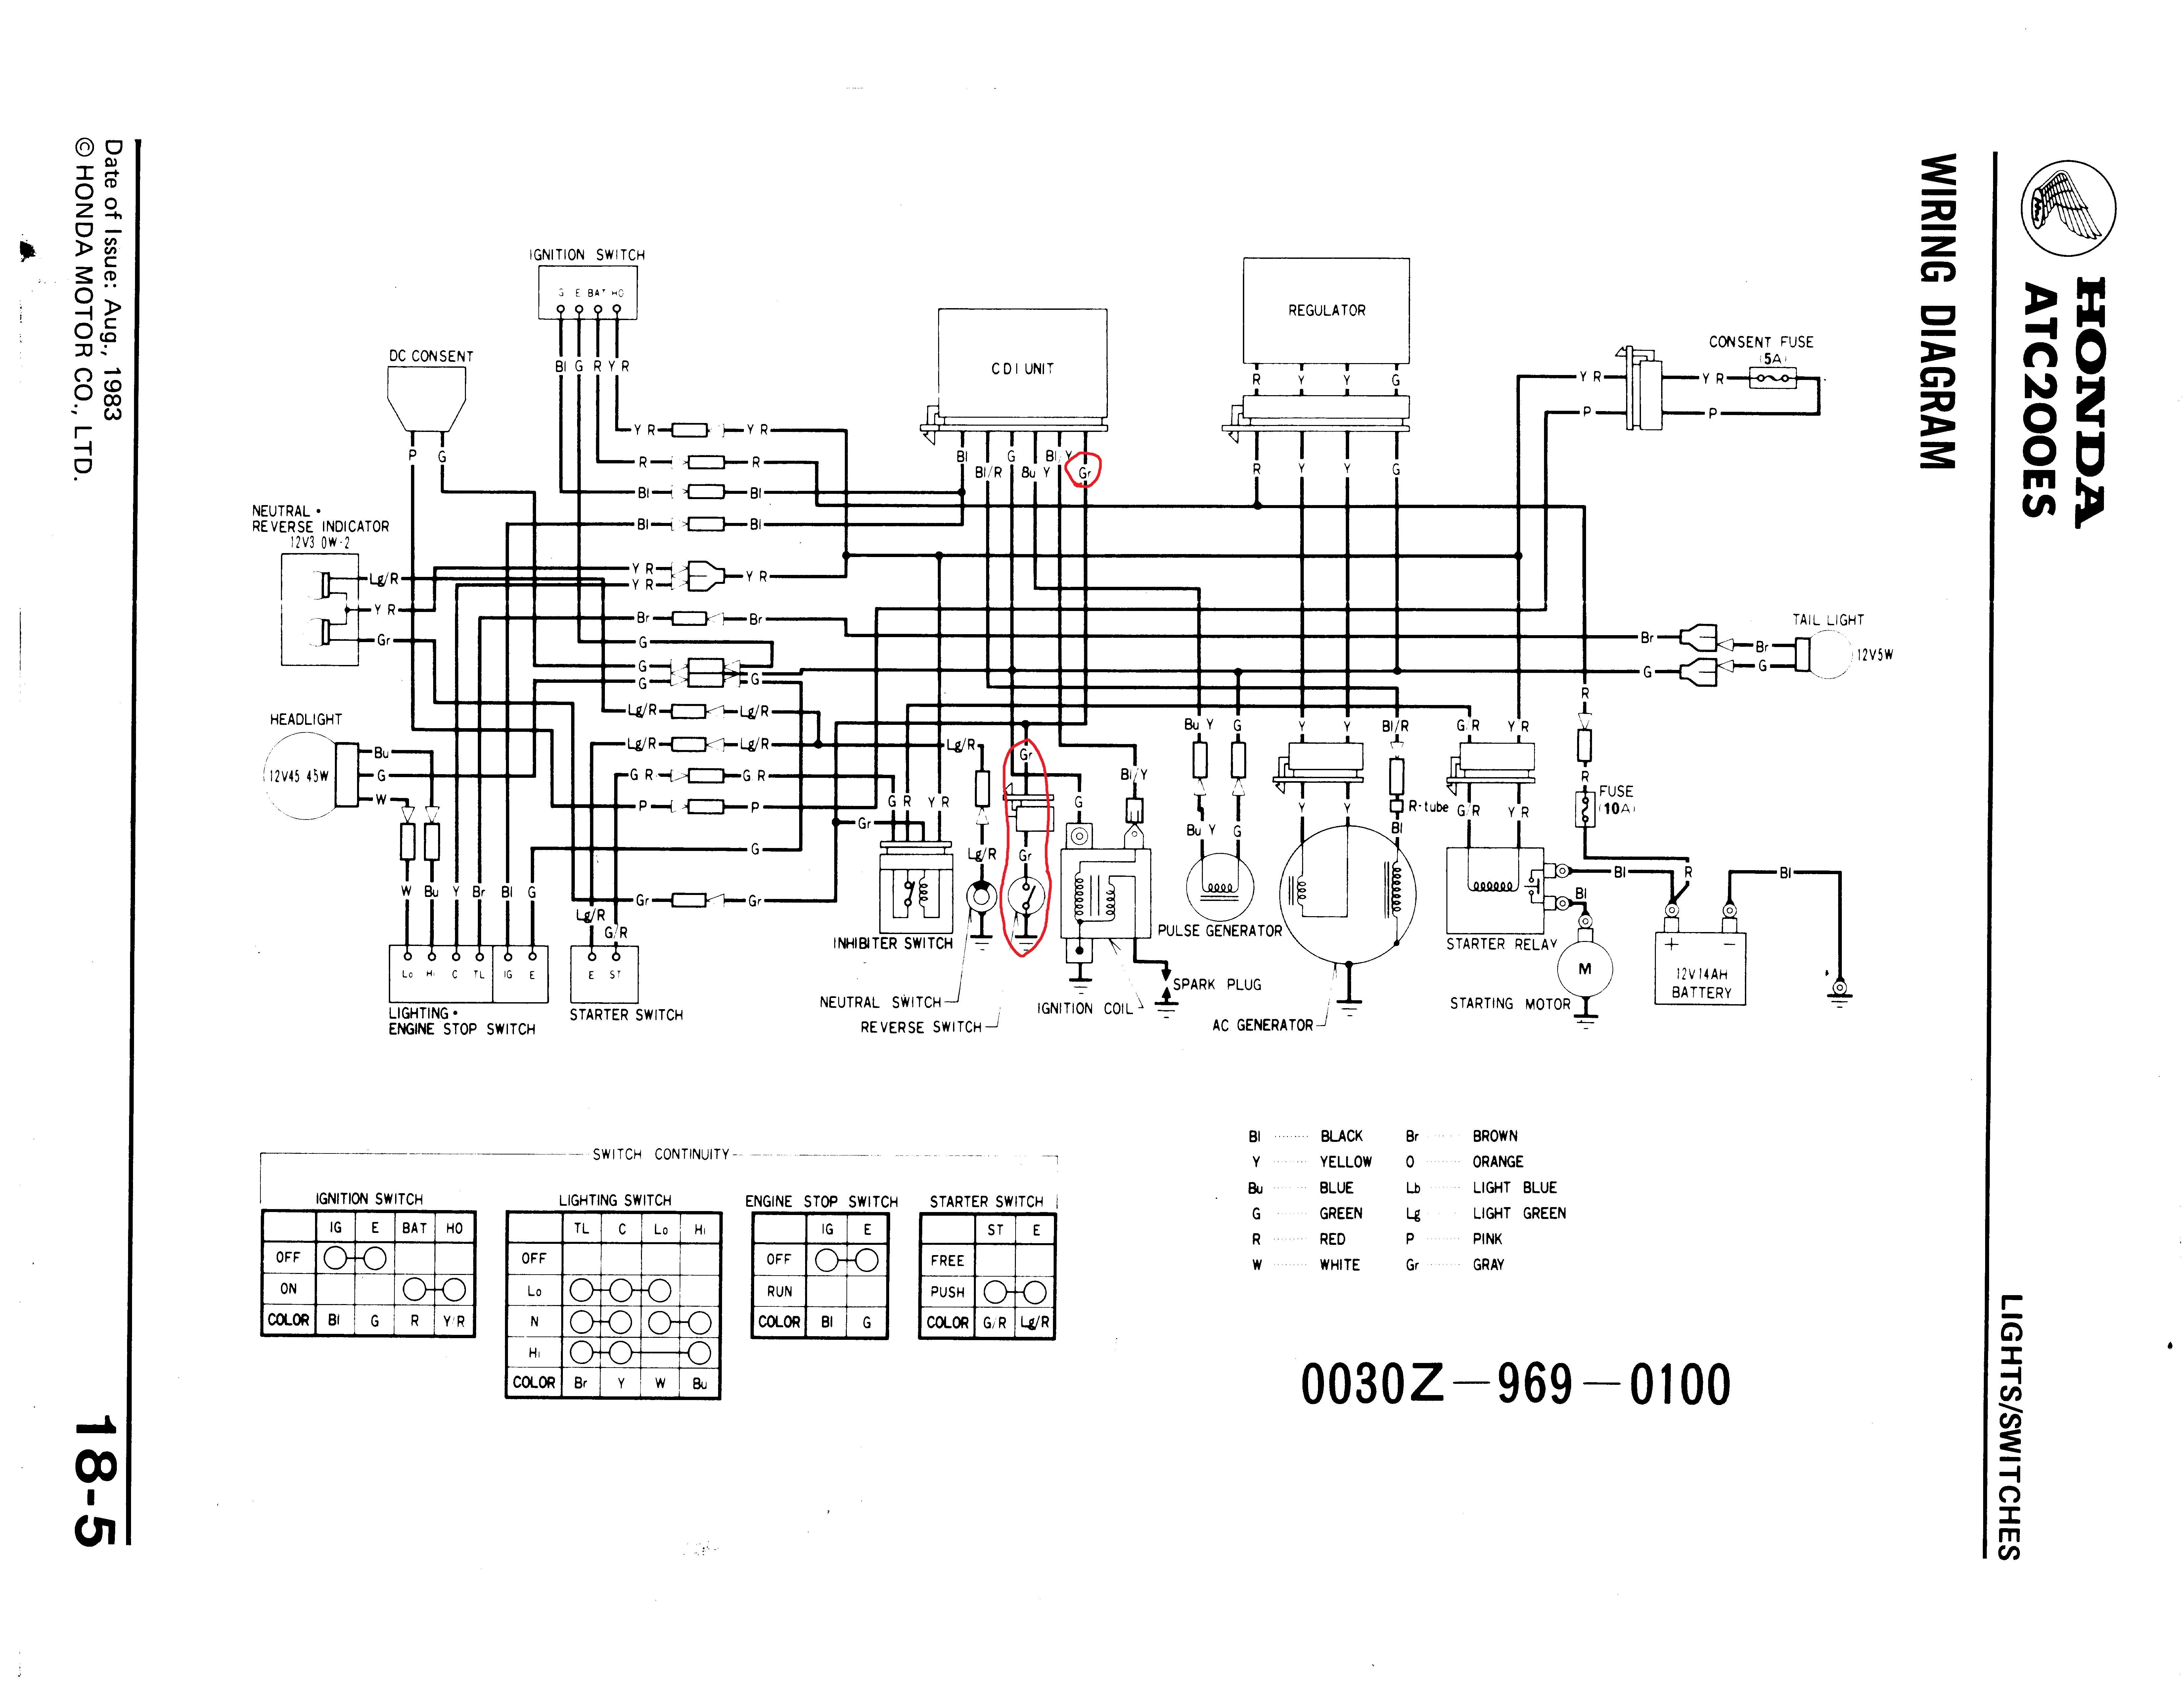 Outstanding Honda Trx 300 Atv Wiring Diagram 1991 General Wiring Diagram Data Wiring Cloud Orsalboapumohammedshrineorg